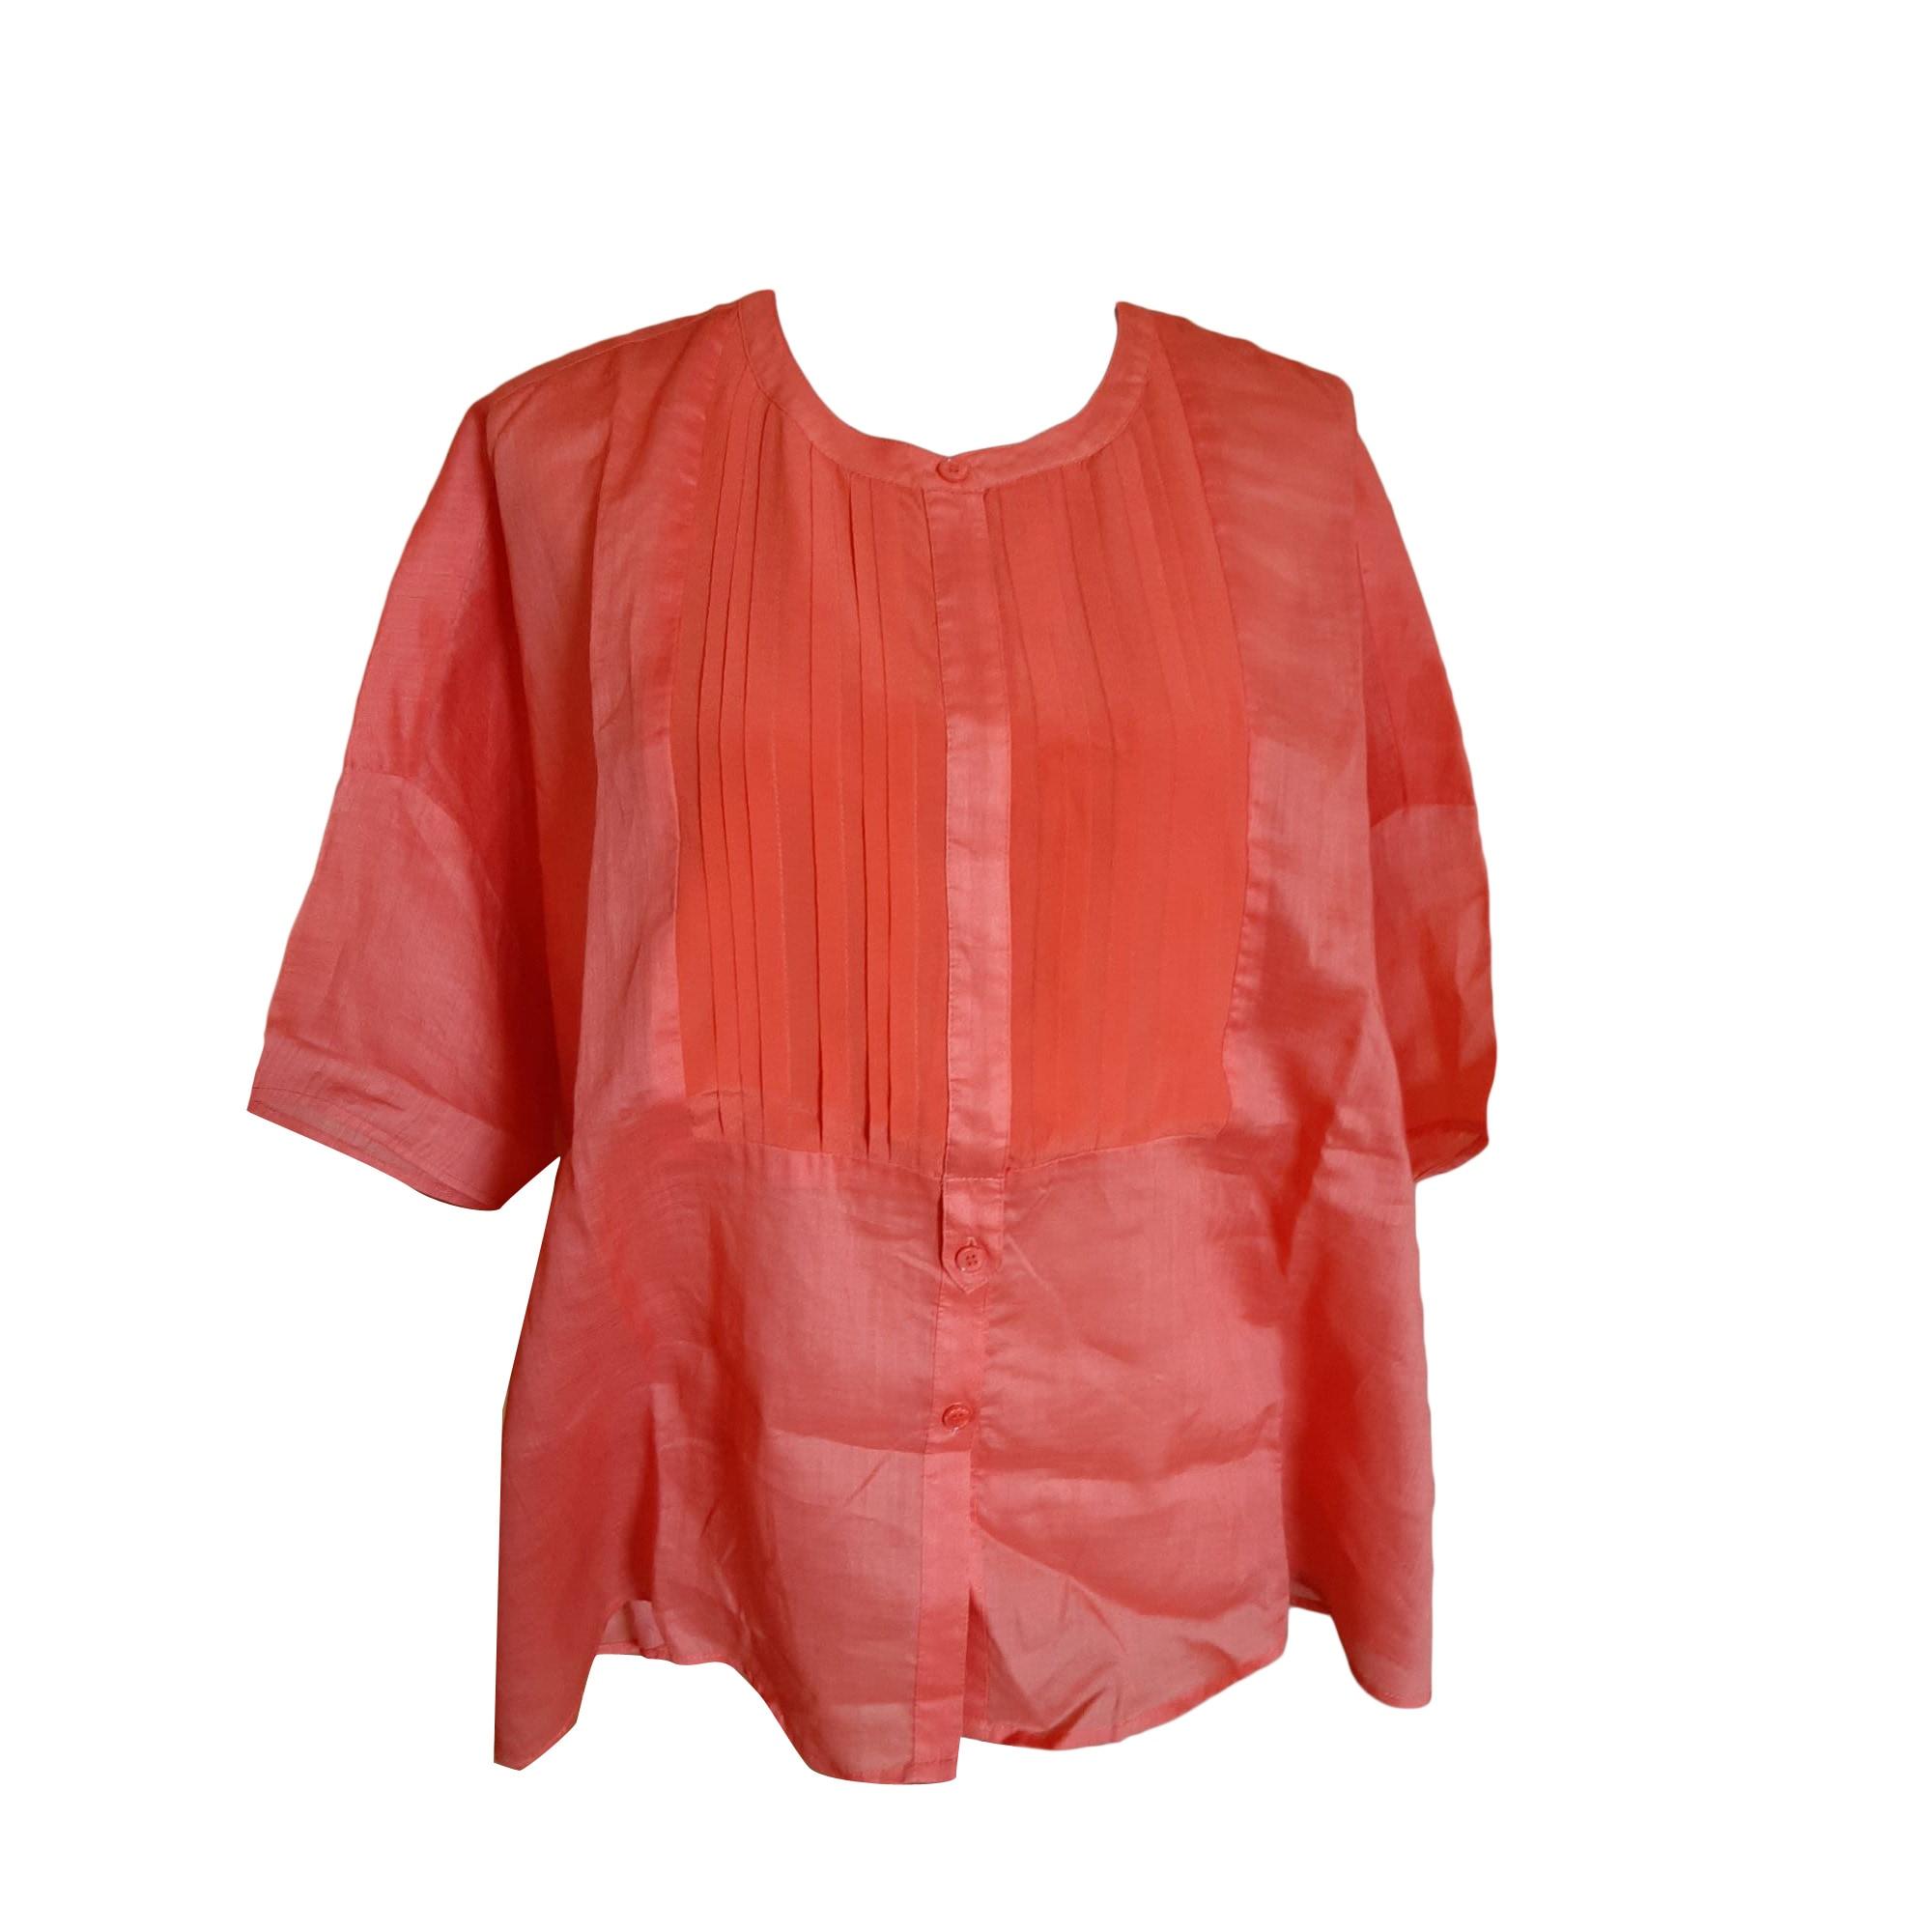 Blouse GERARD DAREL Orange